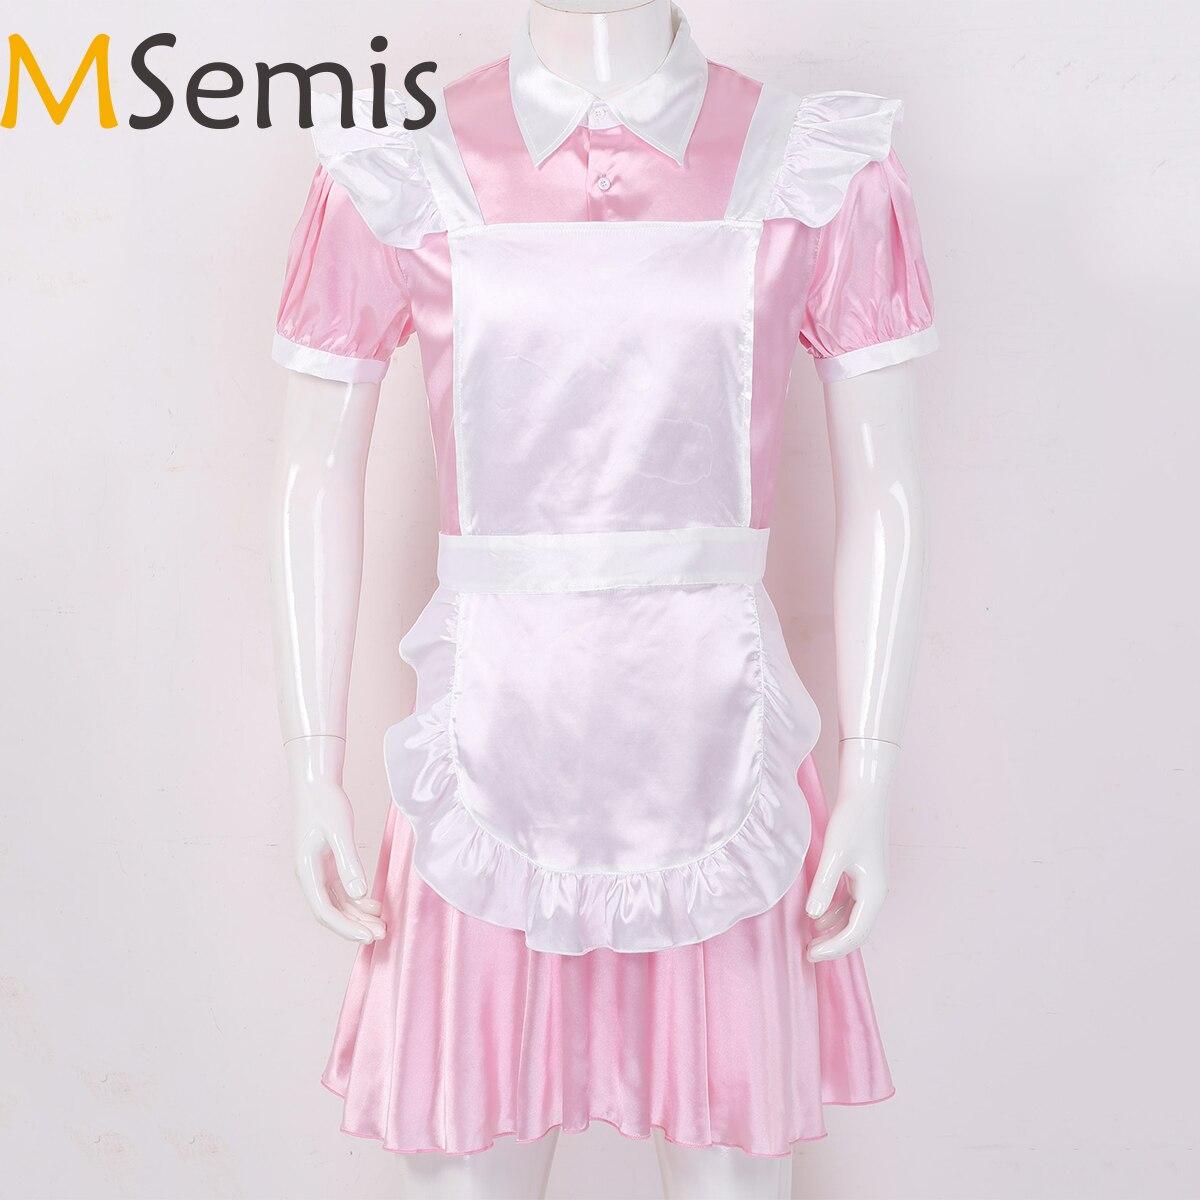 Msemis homens adultos sissy maid vestido cosplay outfit sexy halloween traje sexy crossdressing sexy vestido masculino com avental bandana